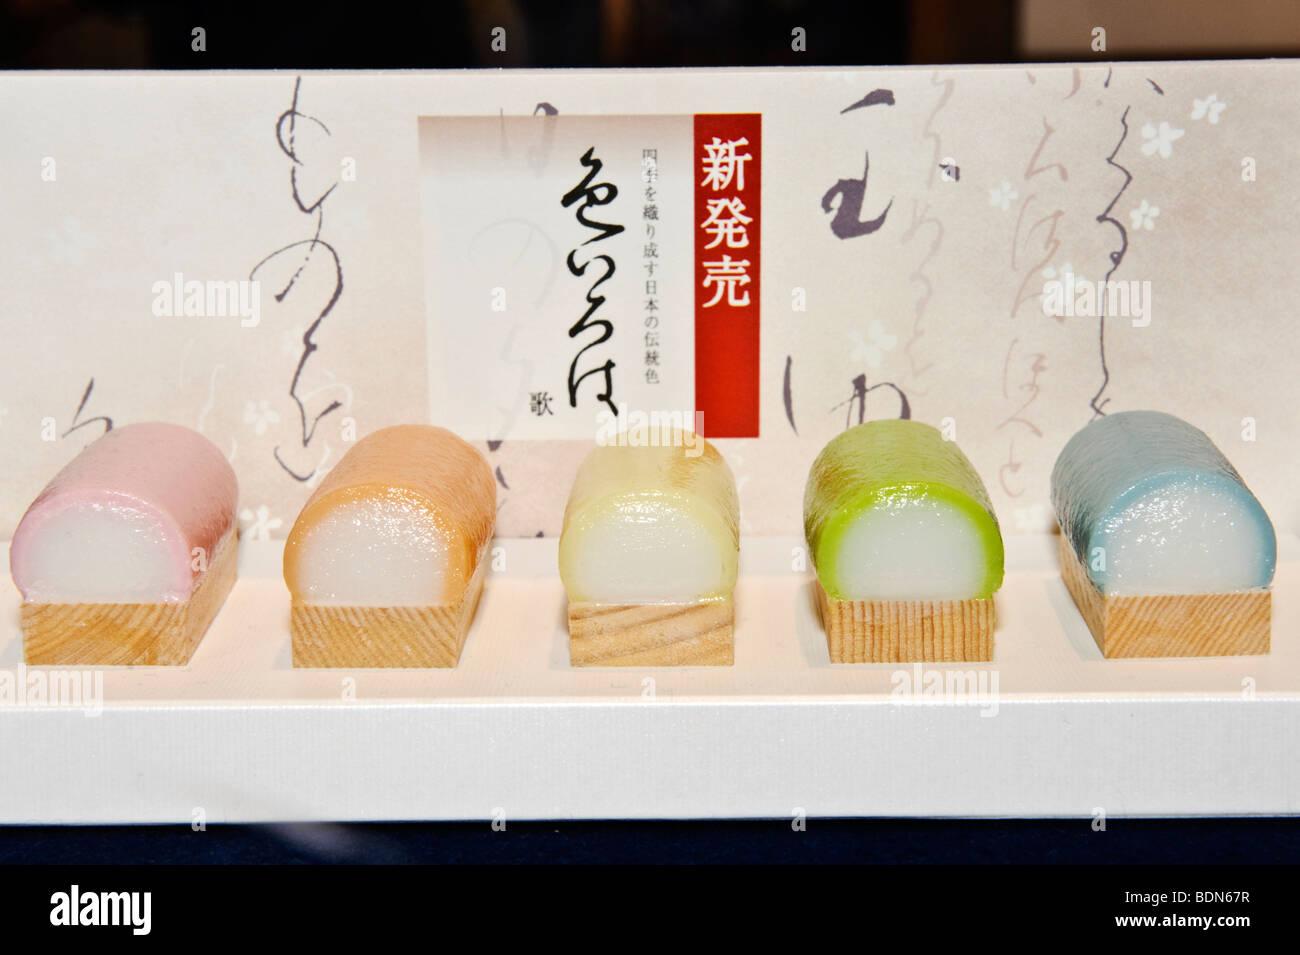 Different colored kamaboko in the gift shop at Suzuhiro kamaboko, Odawara, Kanagawa prefecture, Japan, August 19, - Stock Image